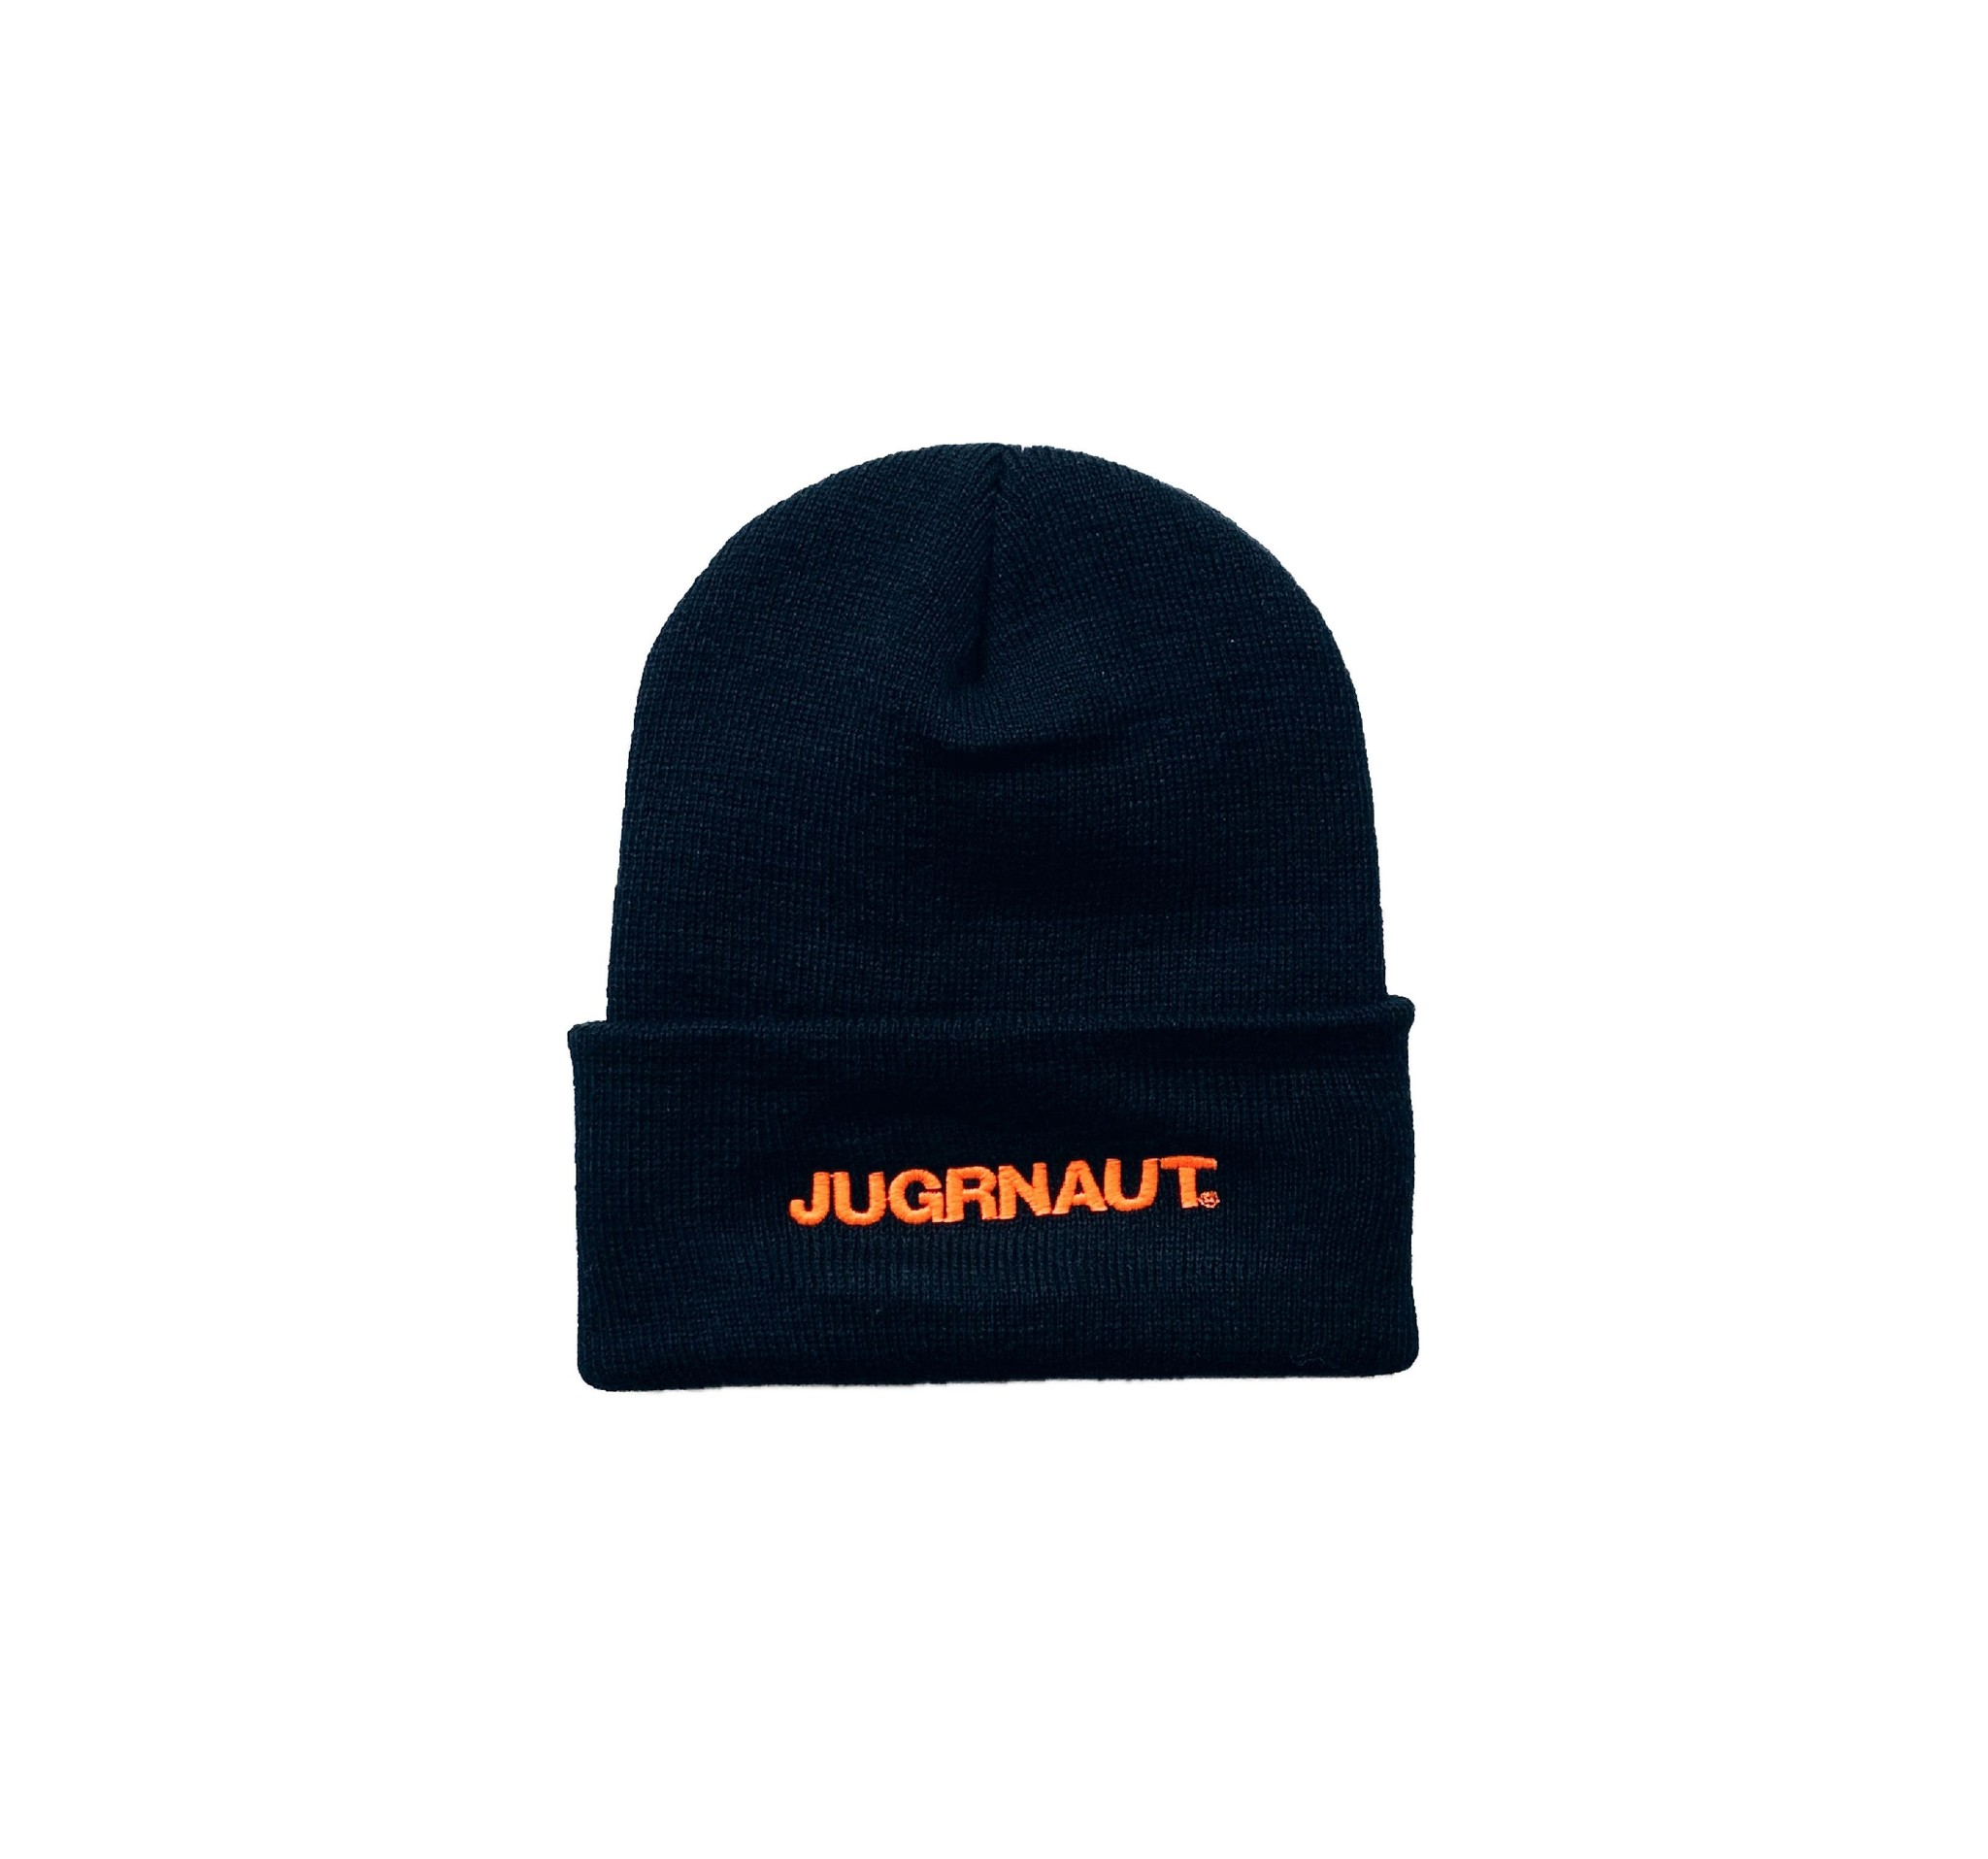 Jugrnaut Jugrnaut Thinsulate Text Logo Black